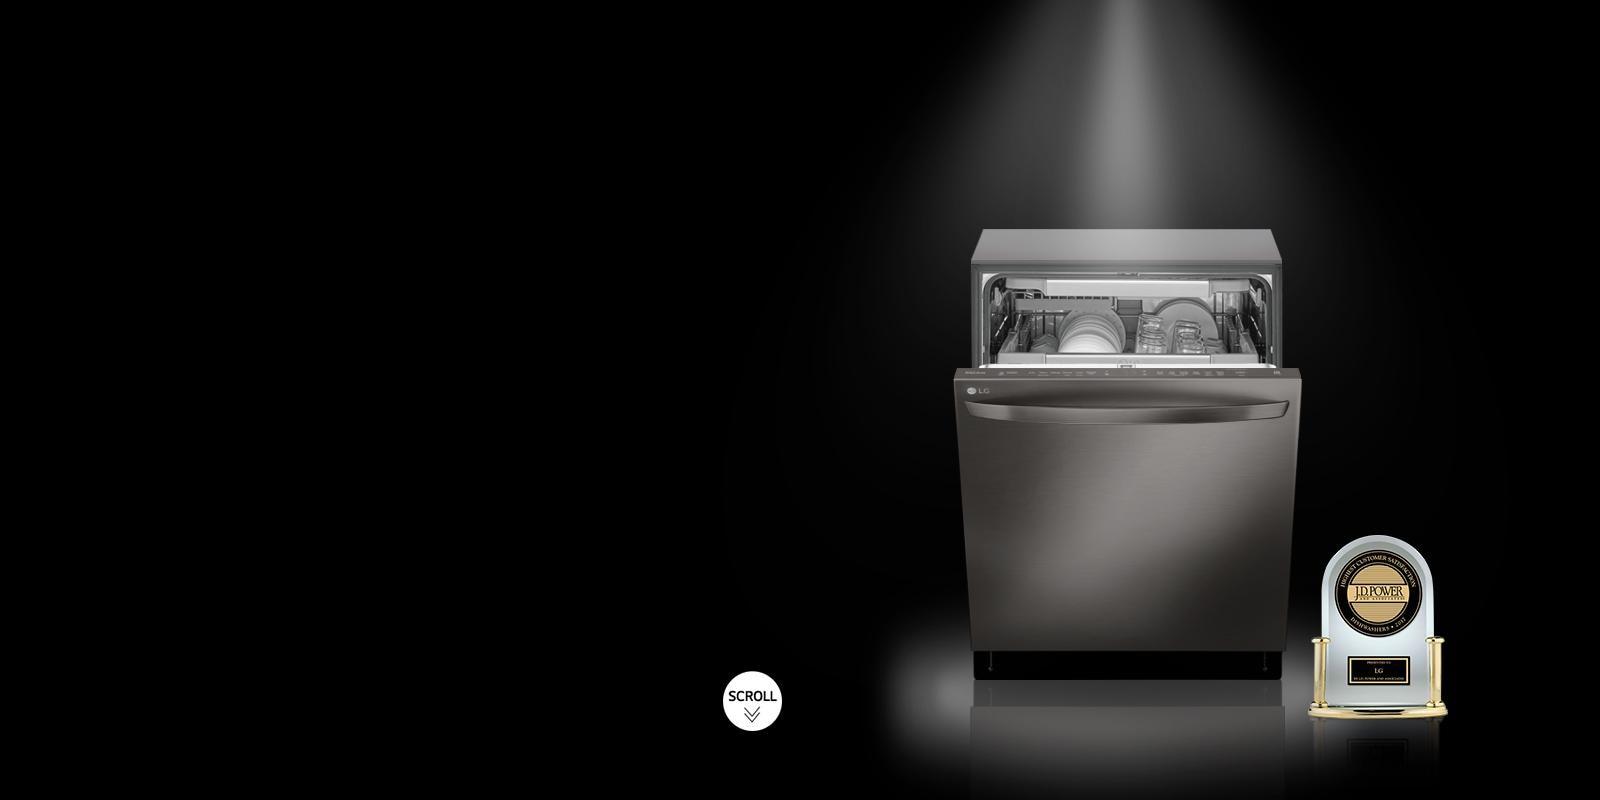 Lg Dishwashers With Innovative Technology Lg Usa